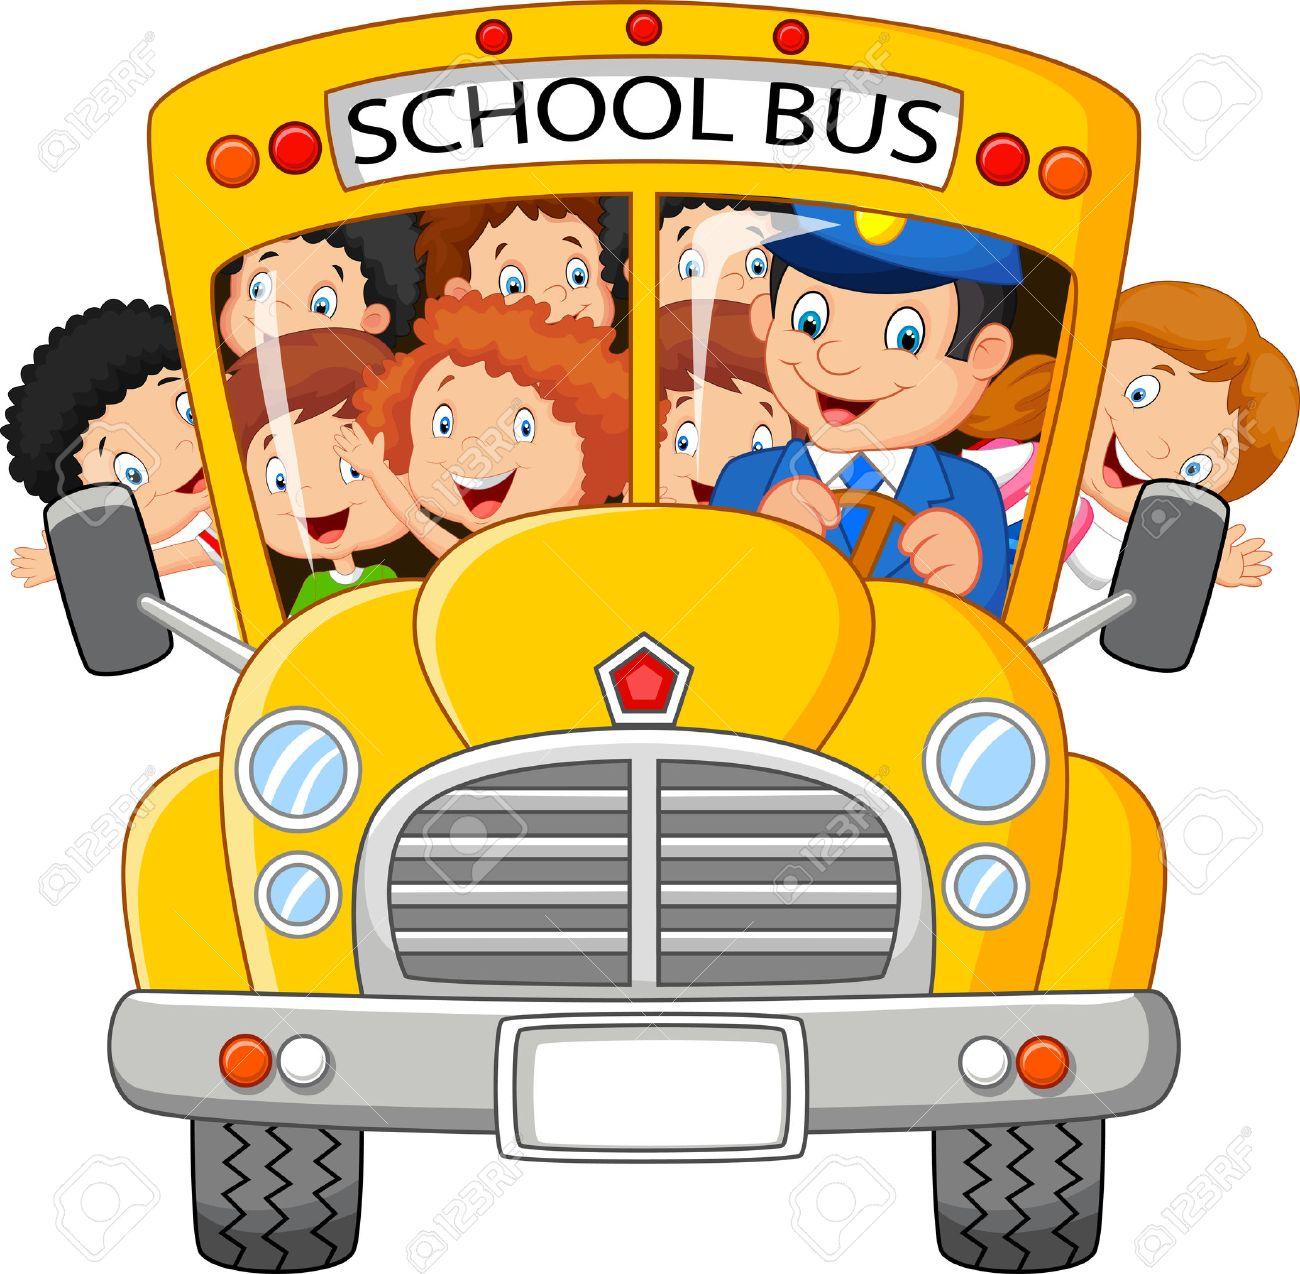 School Kids Cartoon Riding A School Bus Royalty Free Cliparts